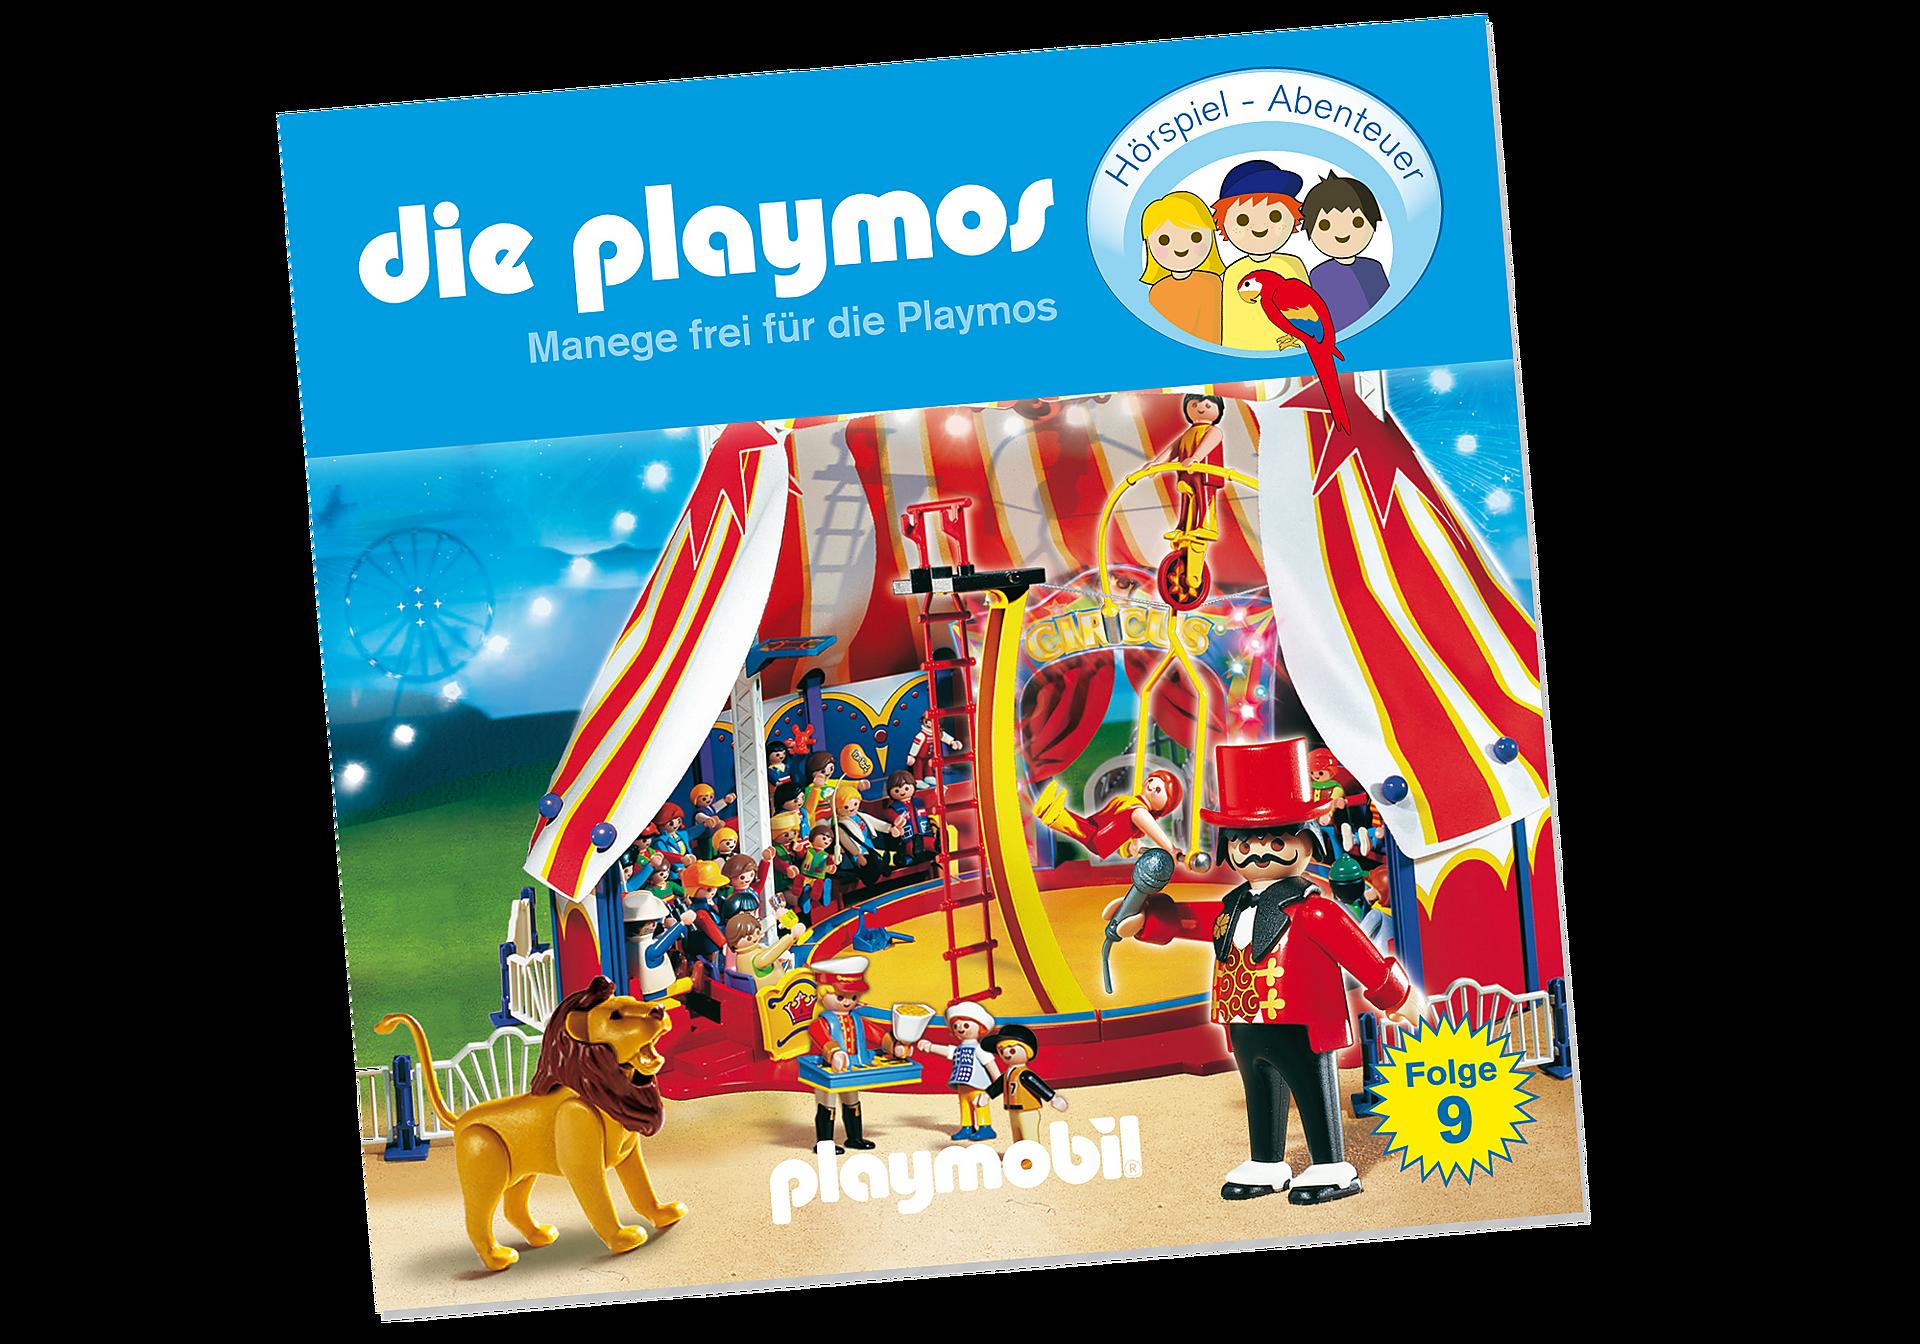 80186 Manege frei für die Playmos (9) - CD zoom image1